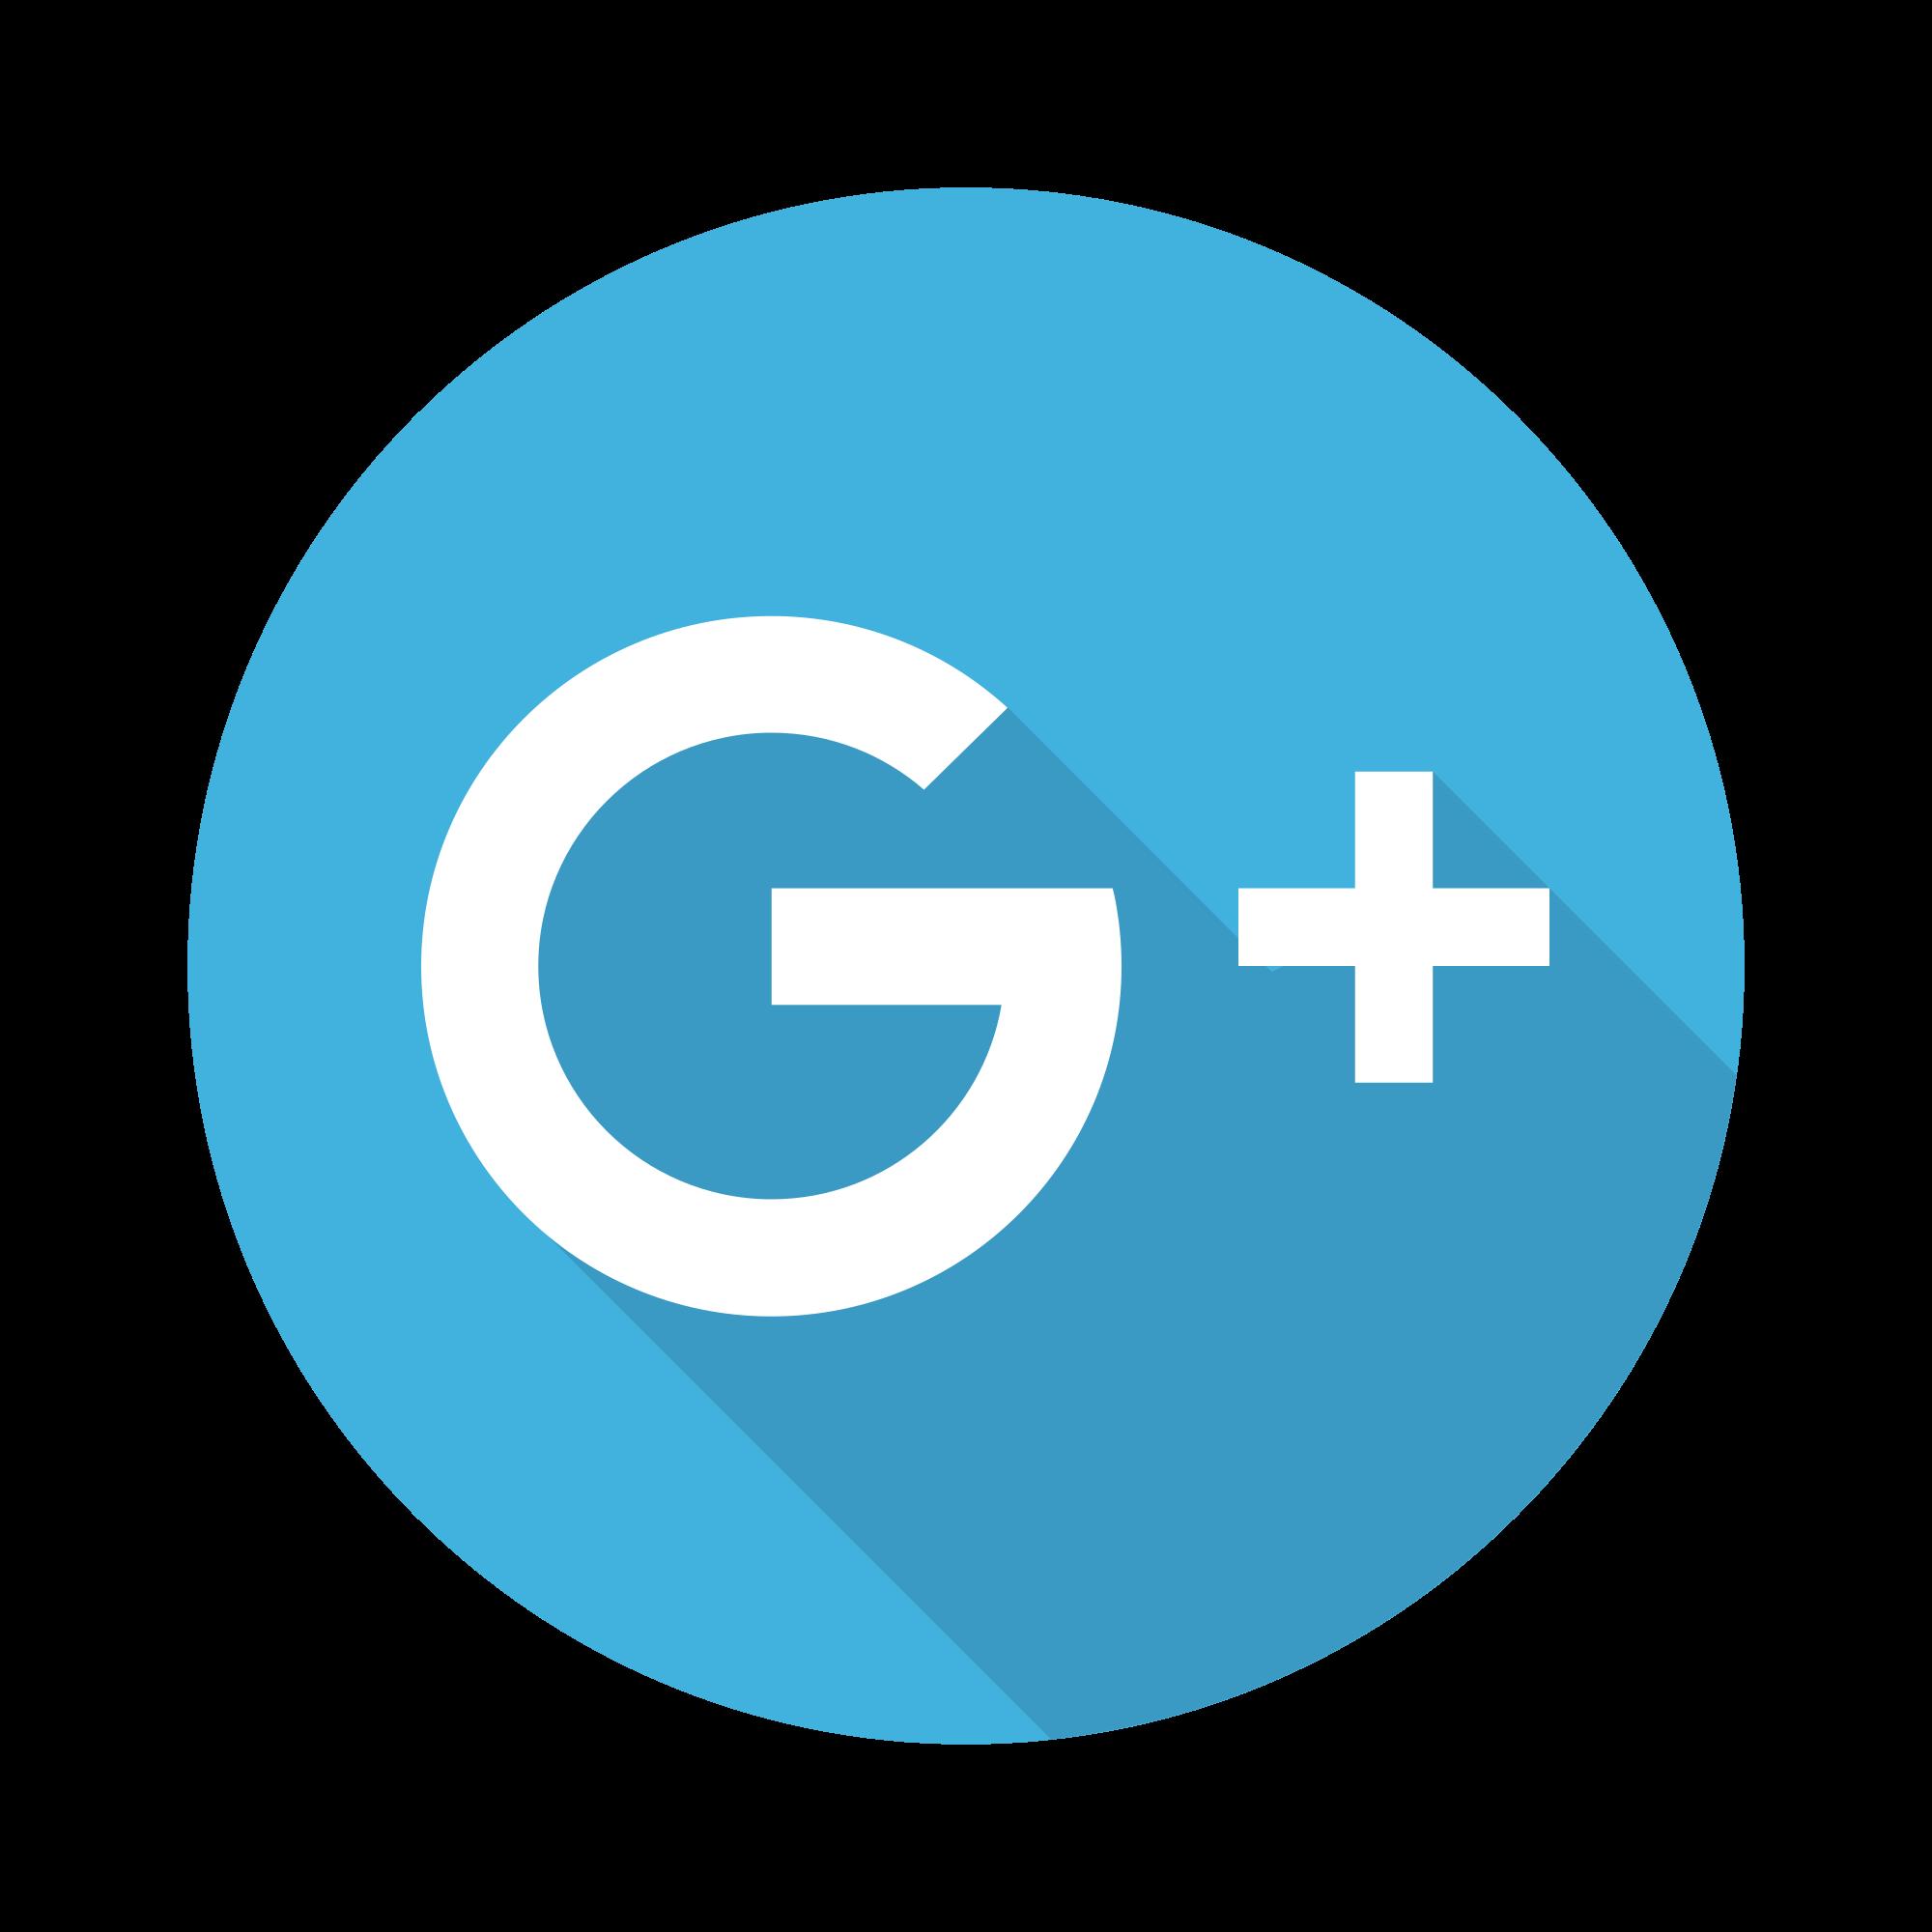 Google plus png. File blue svg wikimedia